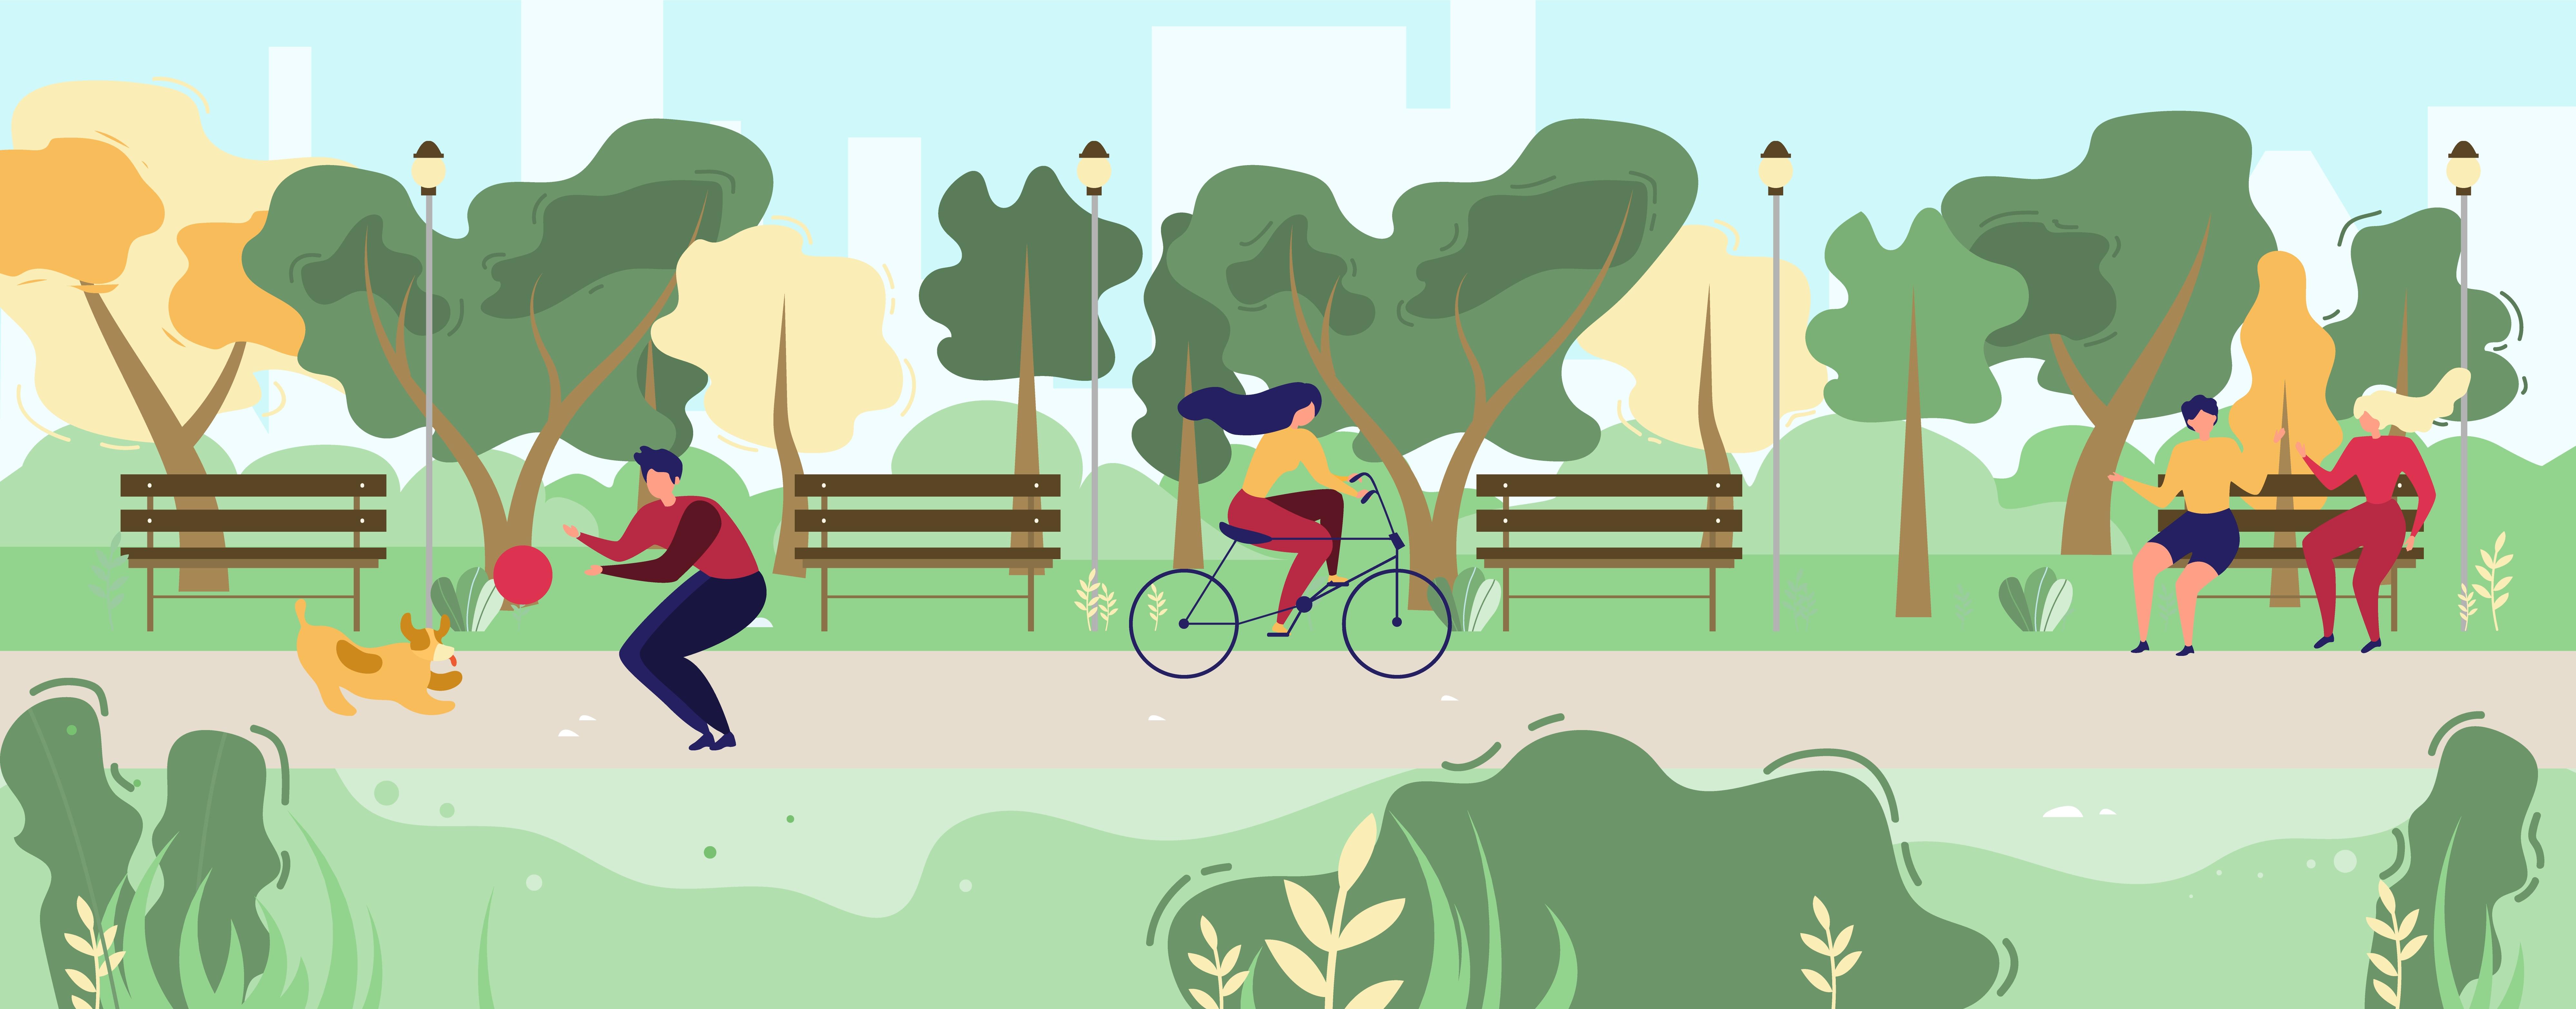 Cartoon People Walking In Flat Urban Public Park Download Free Vectors Clipart Graphics